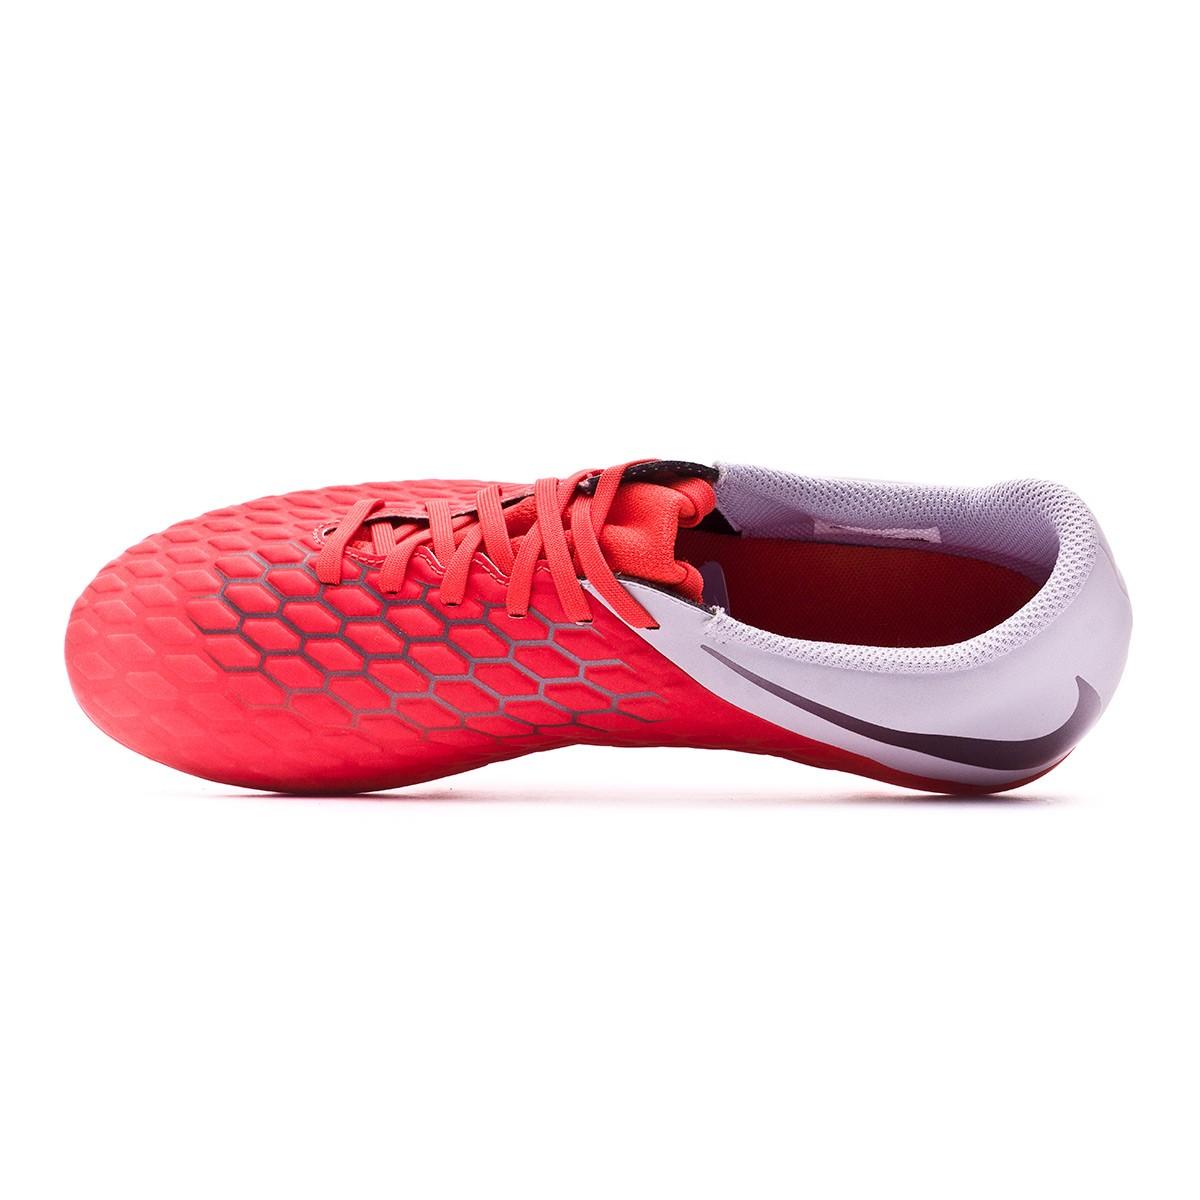 e9e5d1beb383 Football Boots Nike Hypervenom Phantom III Club FG Light crimson-Metallic  dark grey-Wolf grey - Tienda de fútbol Fútbol Emotion